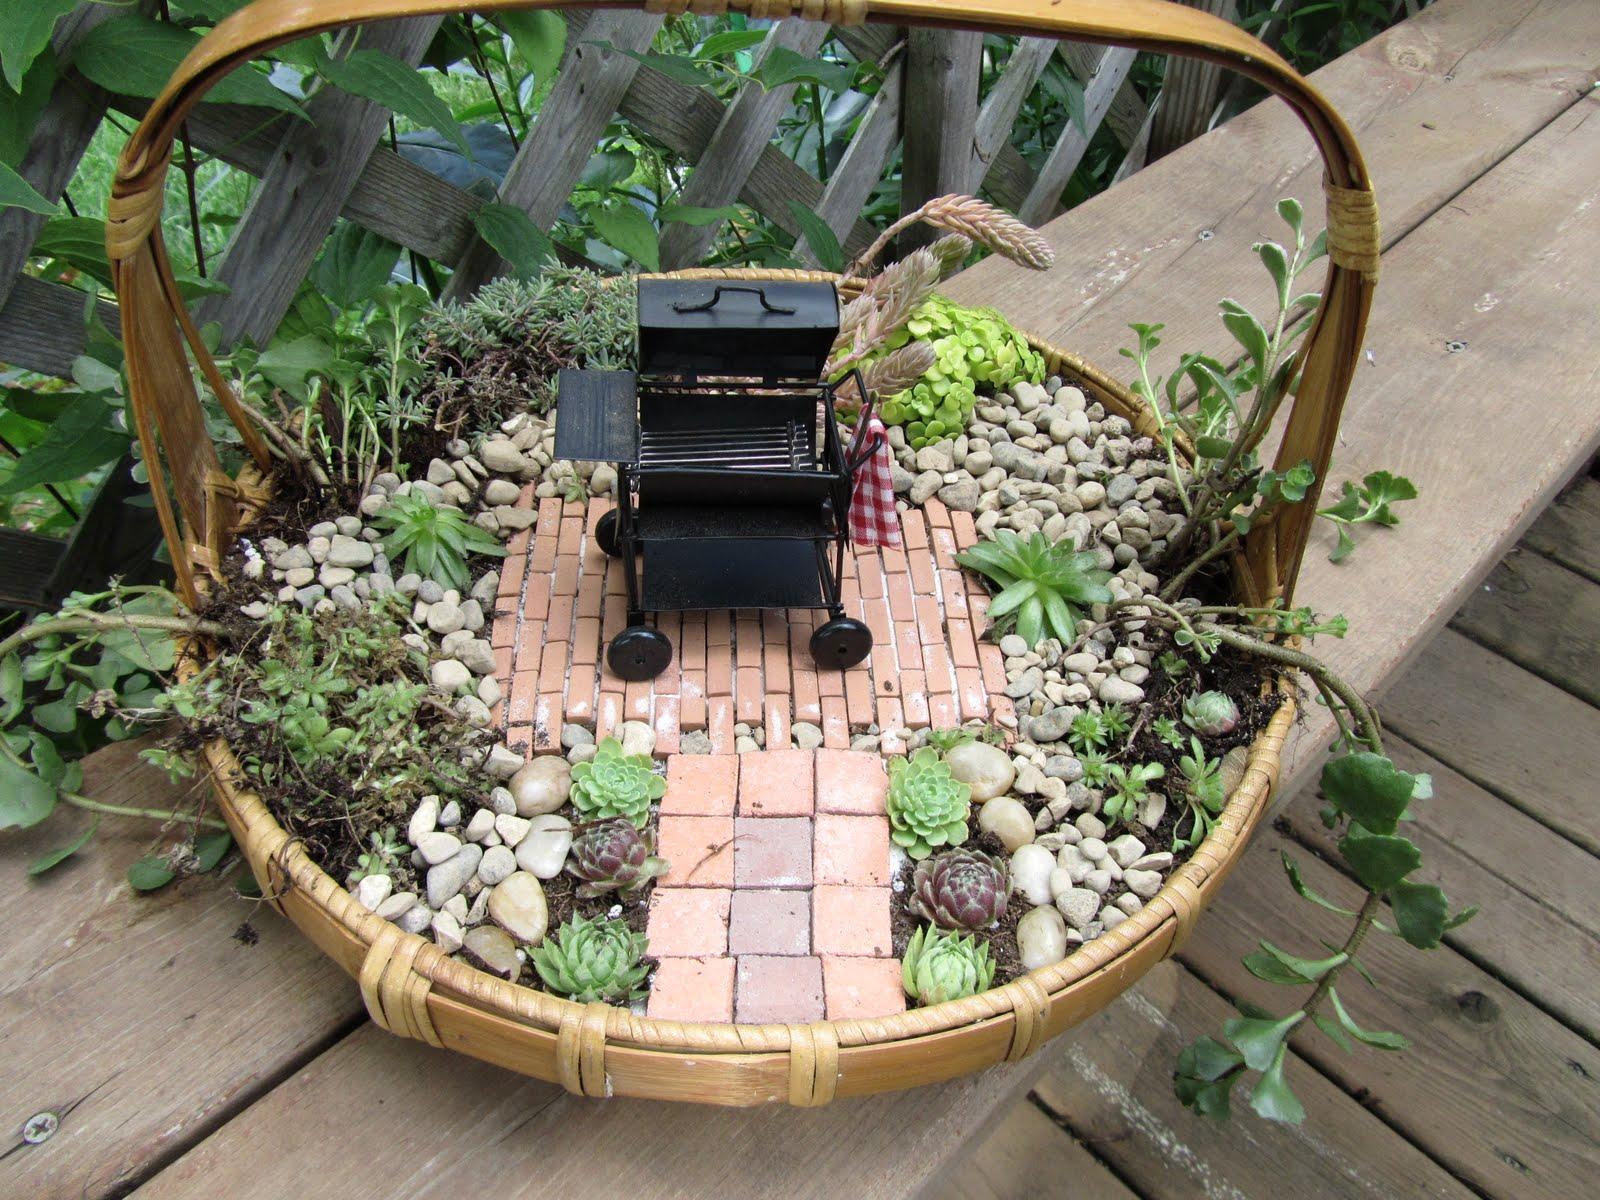 Cheesehead Gardening How To Make The Miniature Gardens